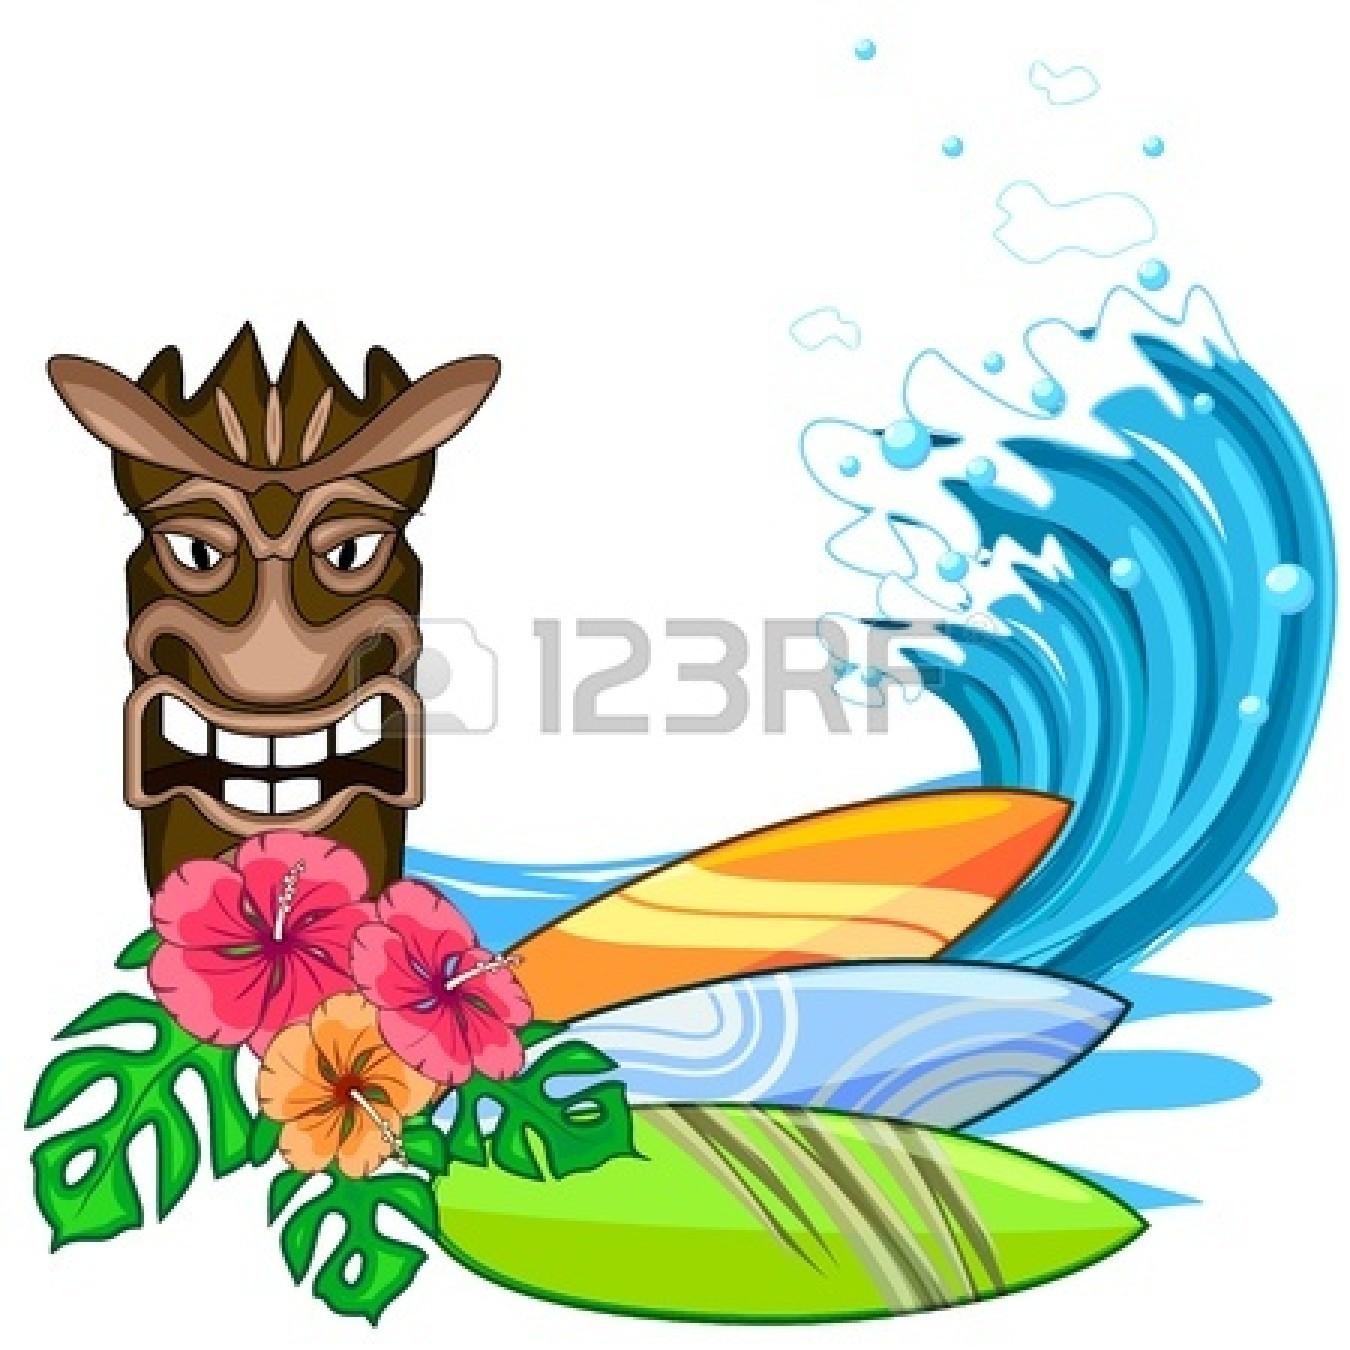 1350x1350 Chic And Creative Tiki Clipart Hawaiian Luau Hula Girl Hibiscus